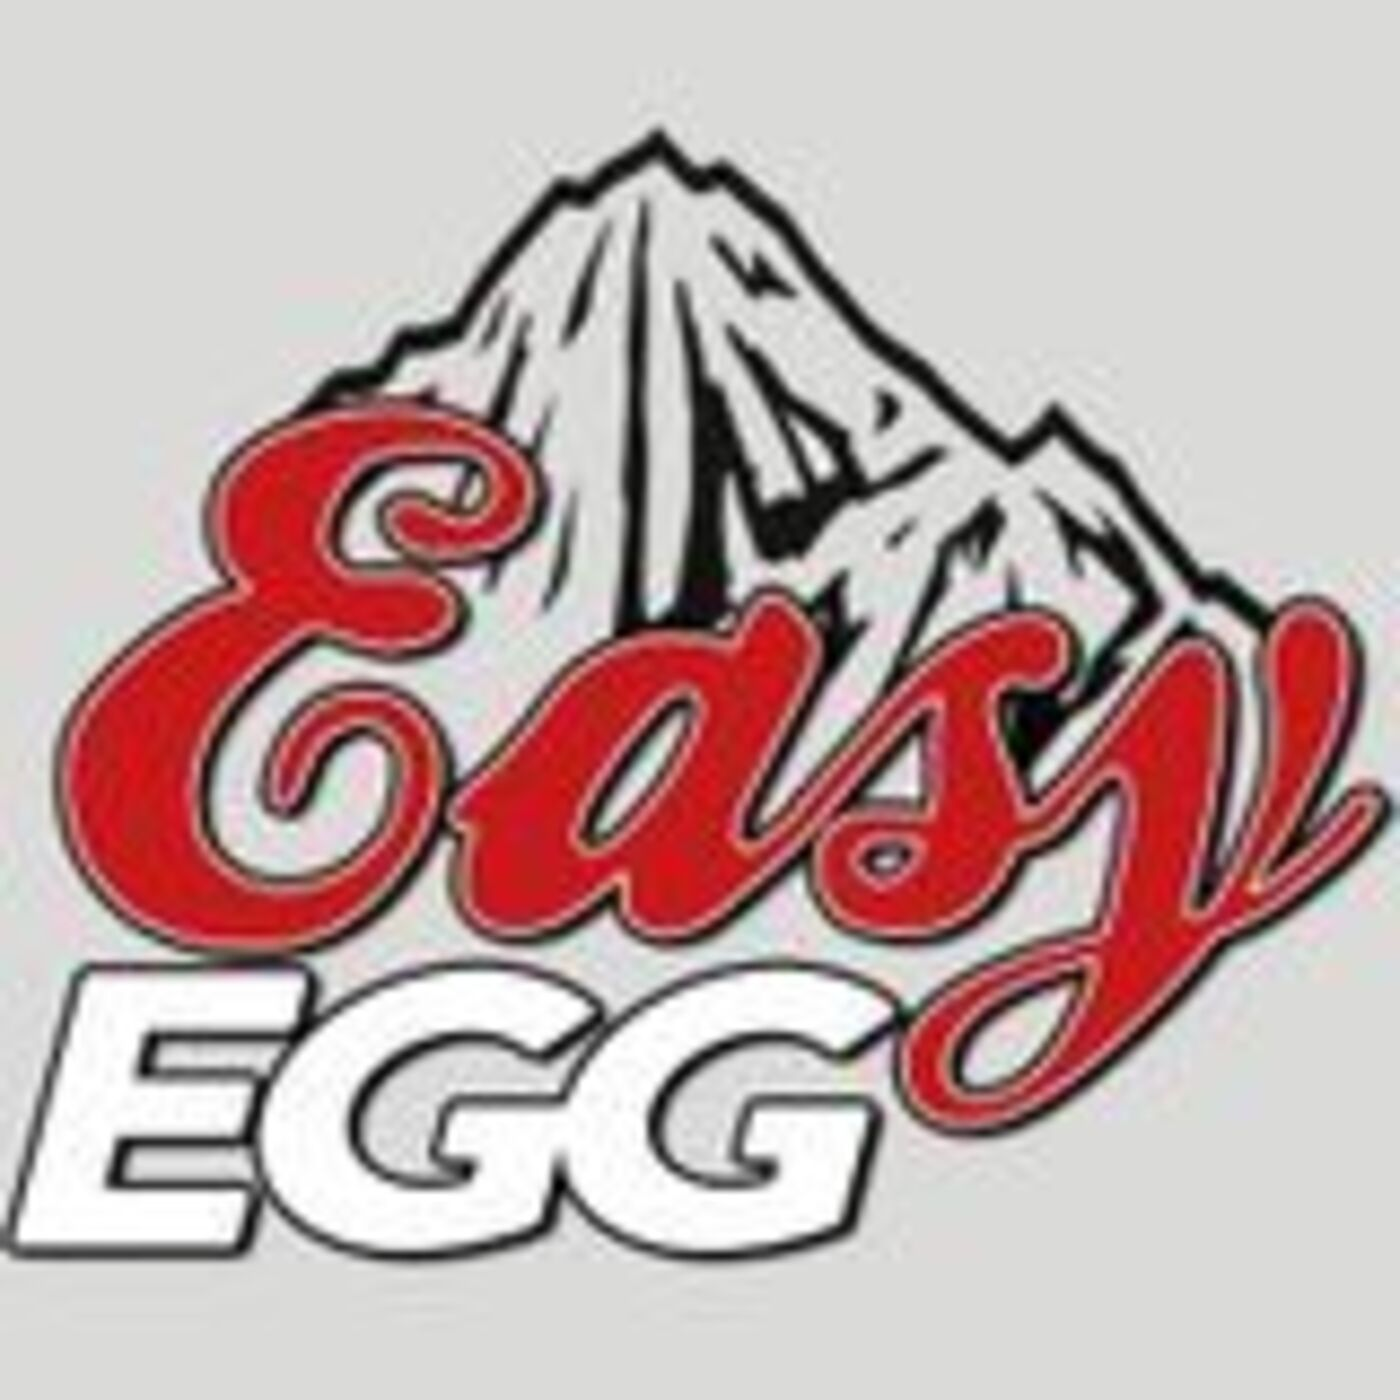 Next Episode X Mary Jane (Easy Egg Segue)